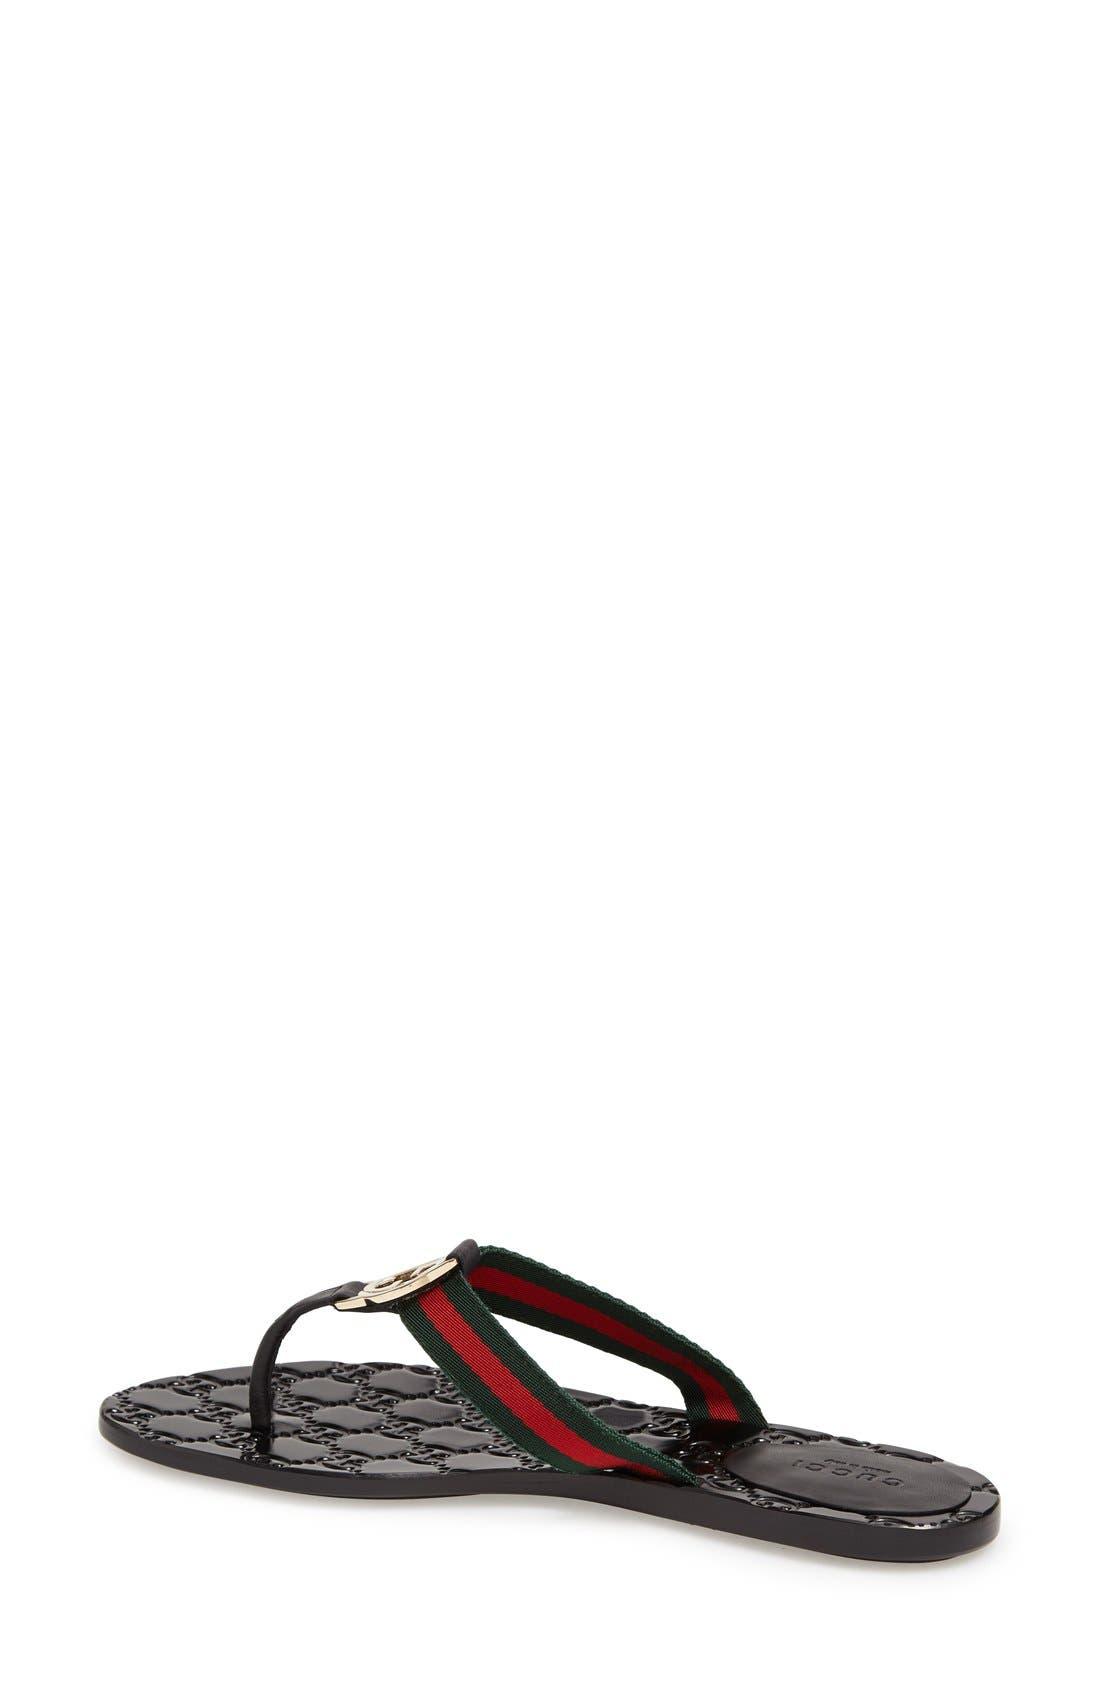 GUCCI,                             'GG' Logo Sandal,                             Alternate thumbnail 3, color,                             NERO